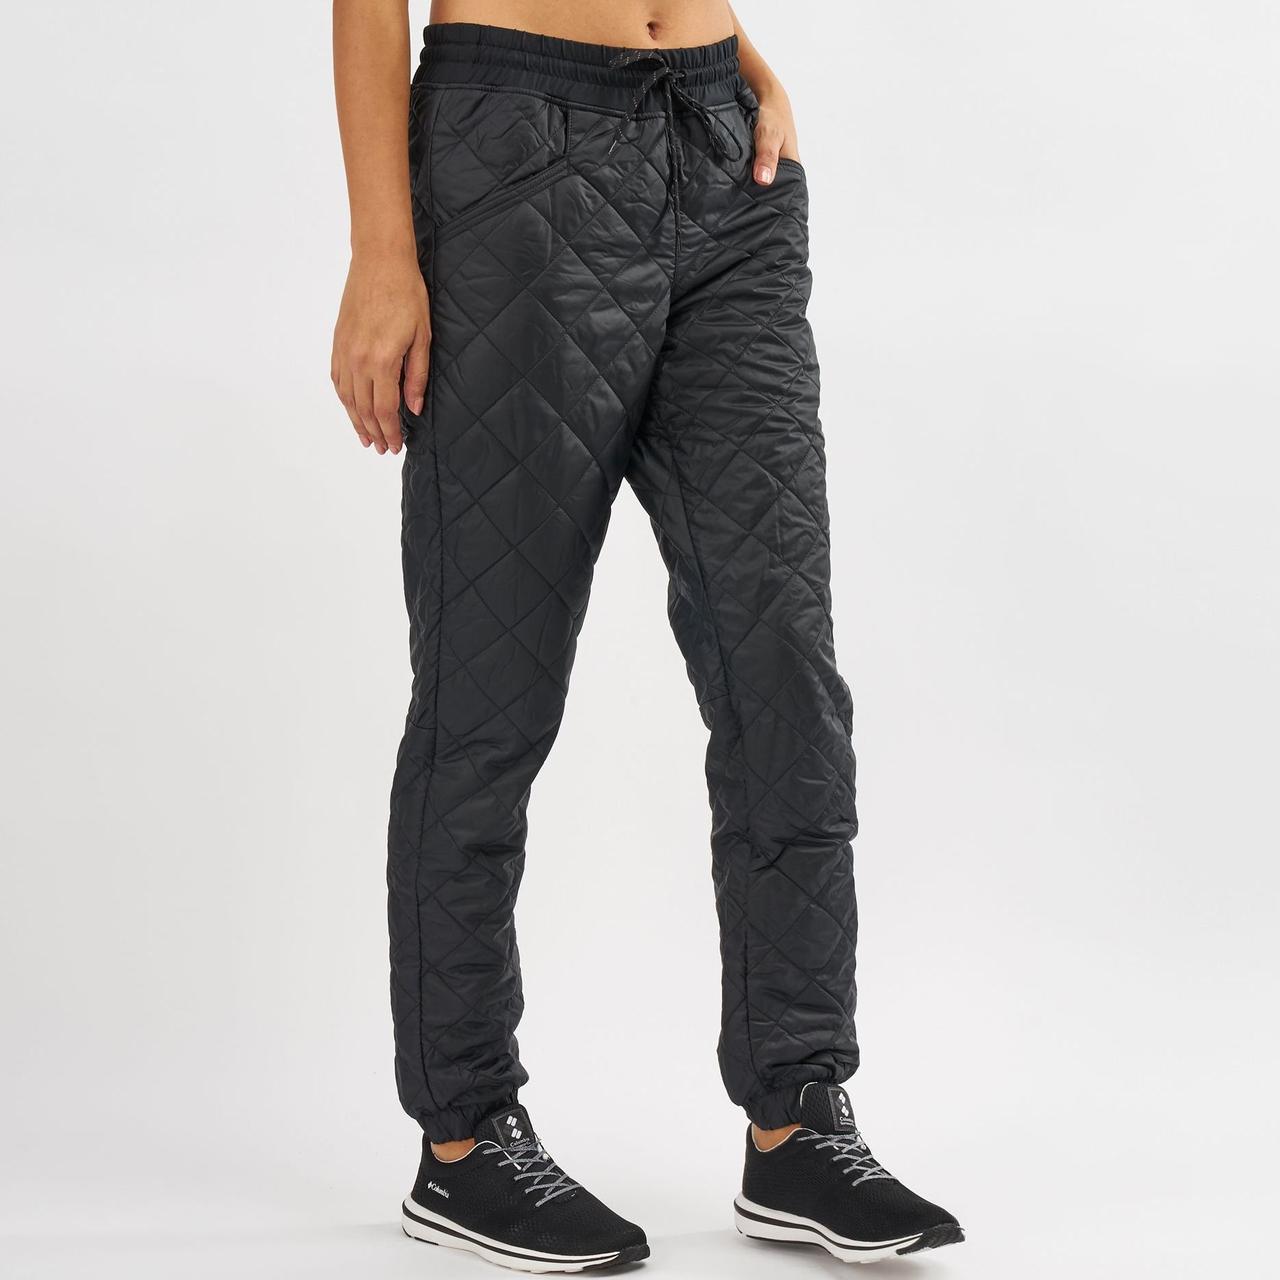 Женские утепленные штаны Columbia Tellico Trek Hybrid Pant Размер XL